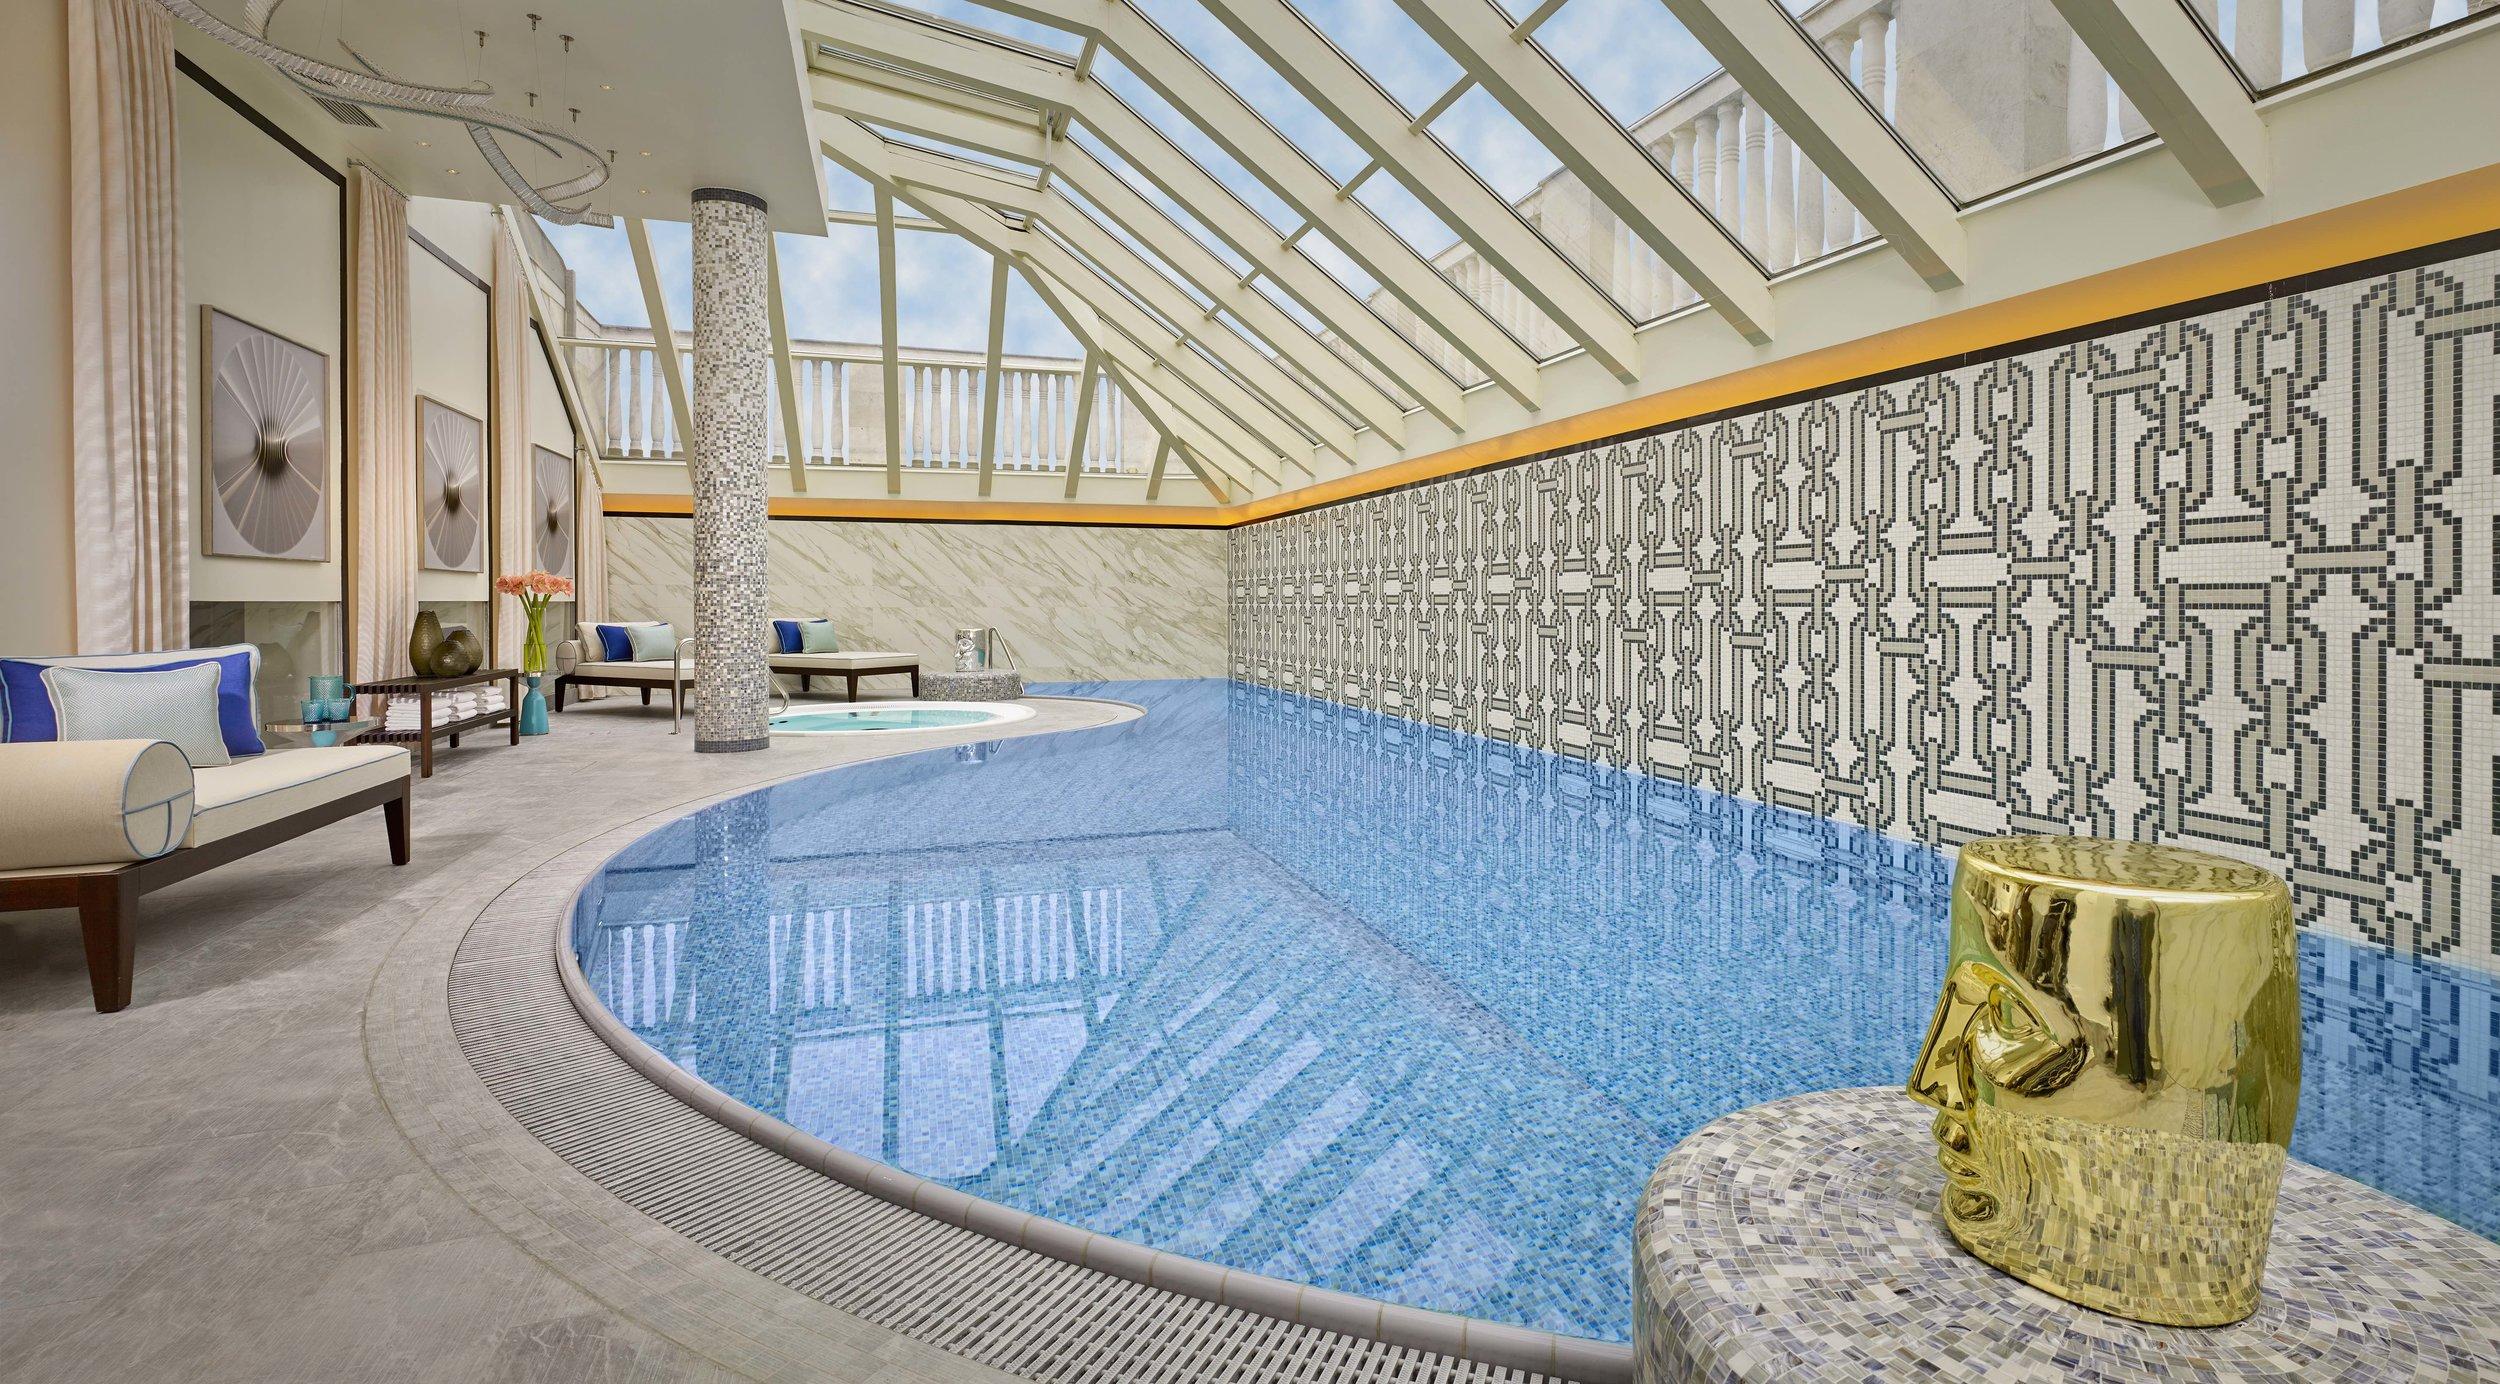 Ritz-Carlton Budapest yoga retreat Exotic Yoga Retreats